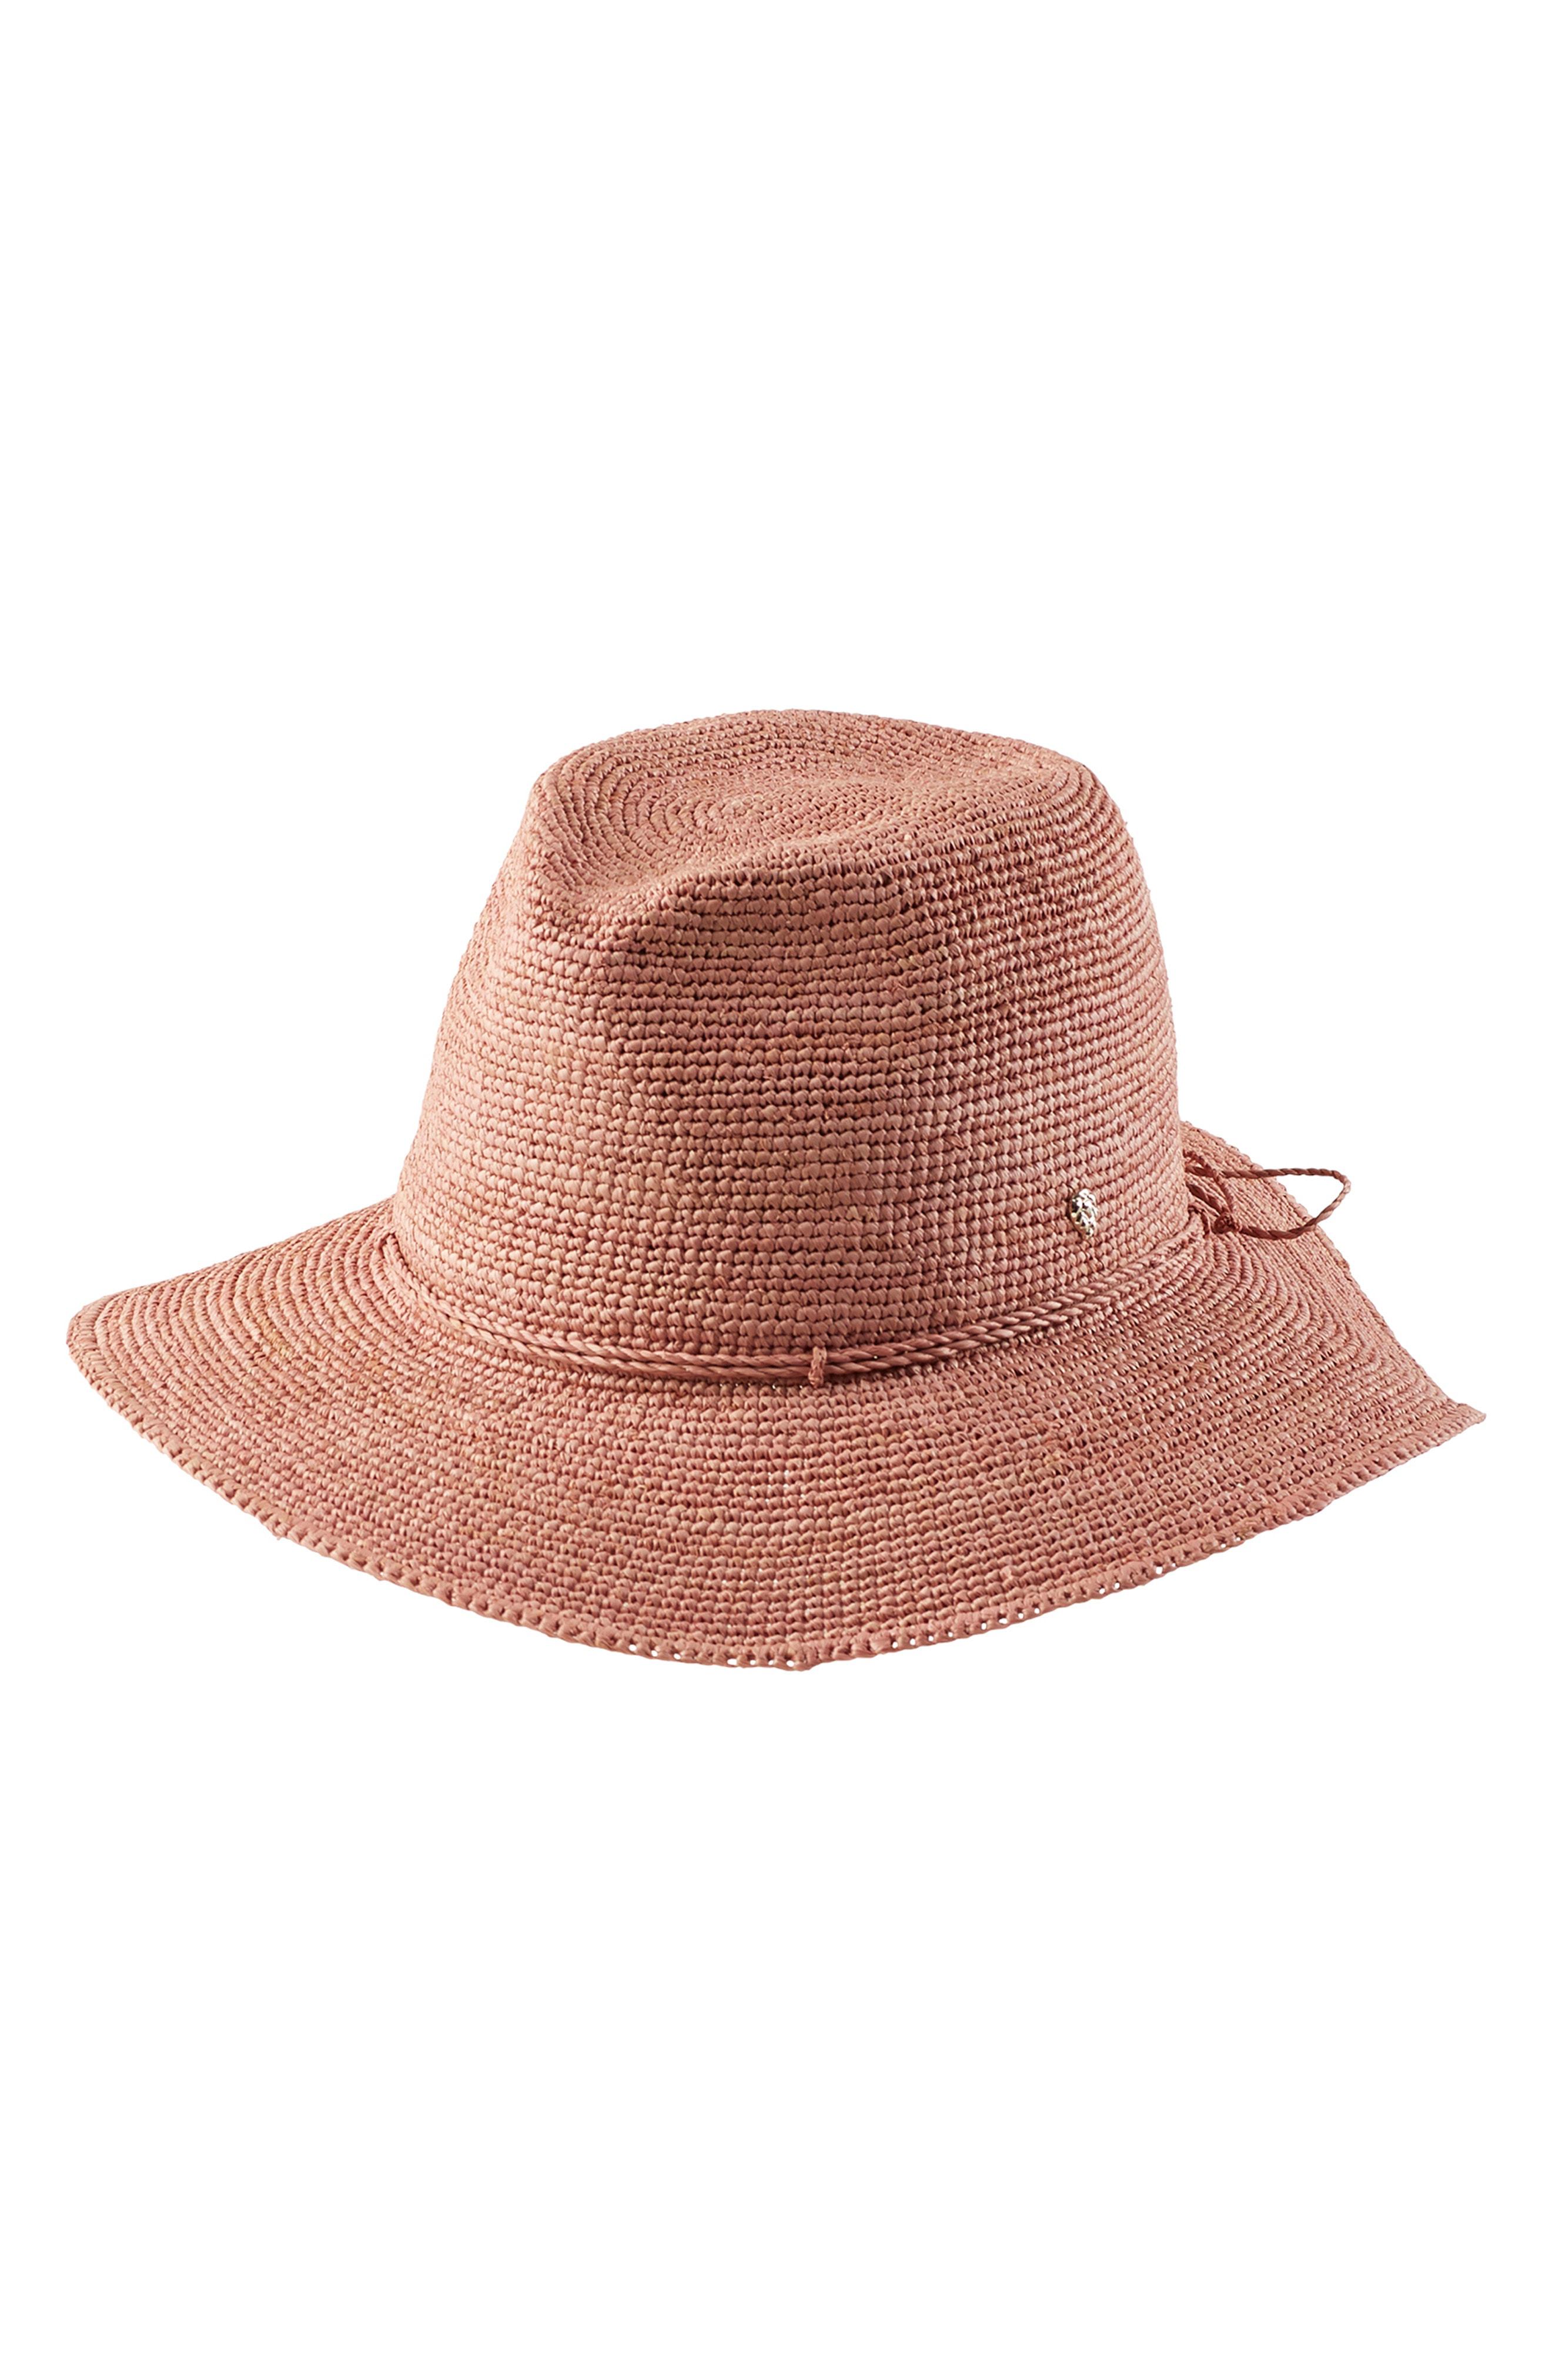 b4077ffe3389 Helen Kaminski Desmonda Packable Raffia Fedora - Pink In Dusty Salmon